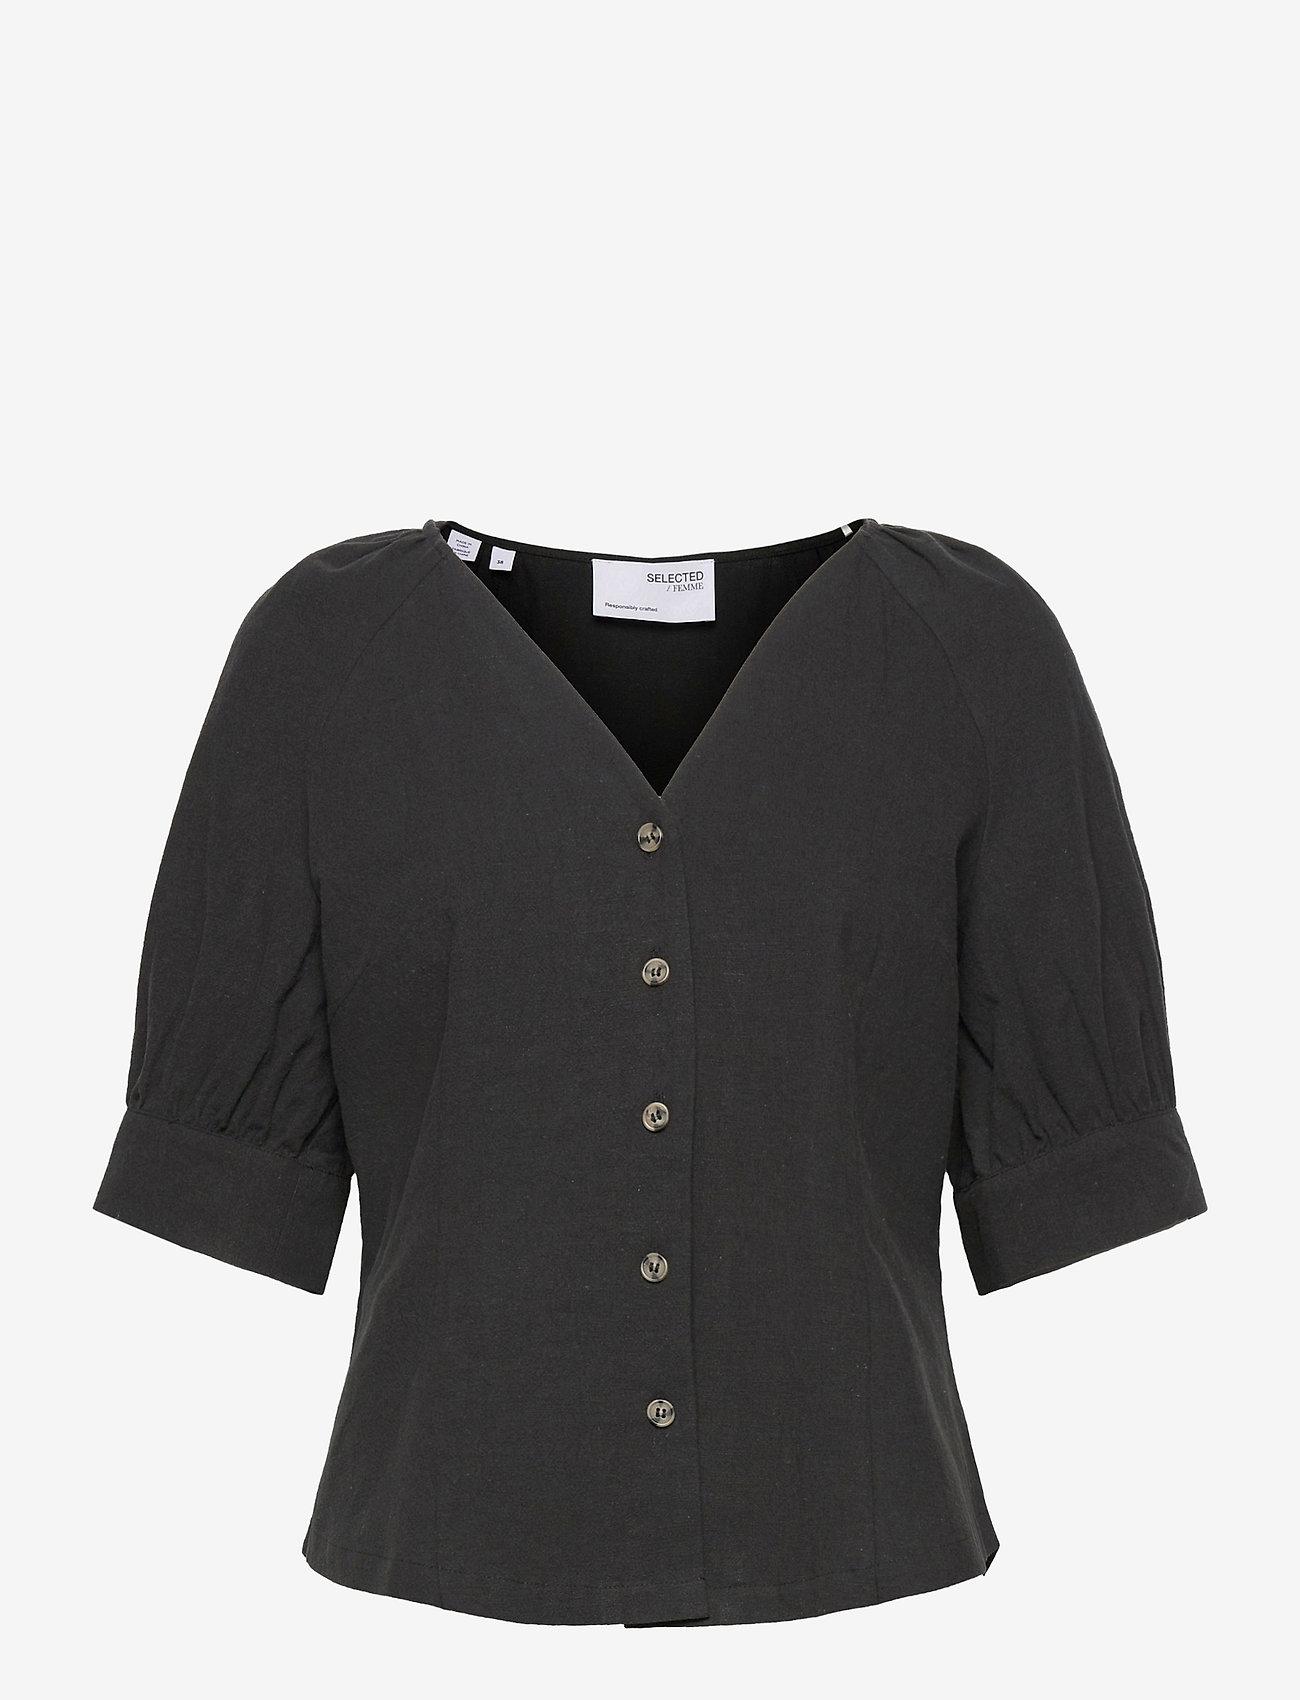 Selected Femme - SLFMALVINA 2/4 SHIRT - kurzämlige blusen - black - 0